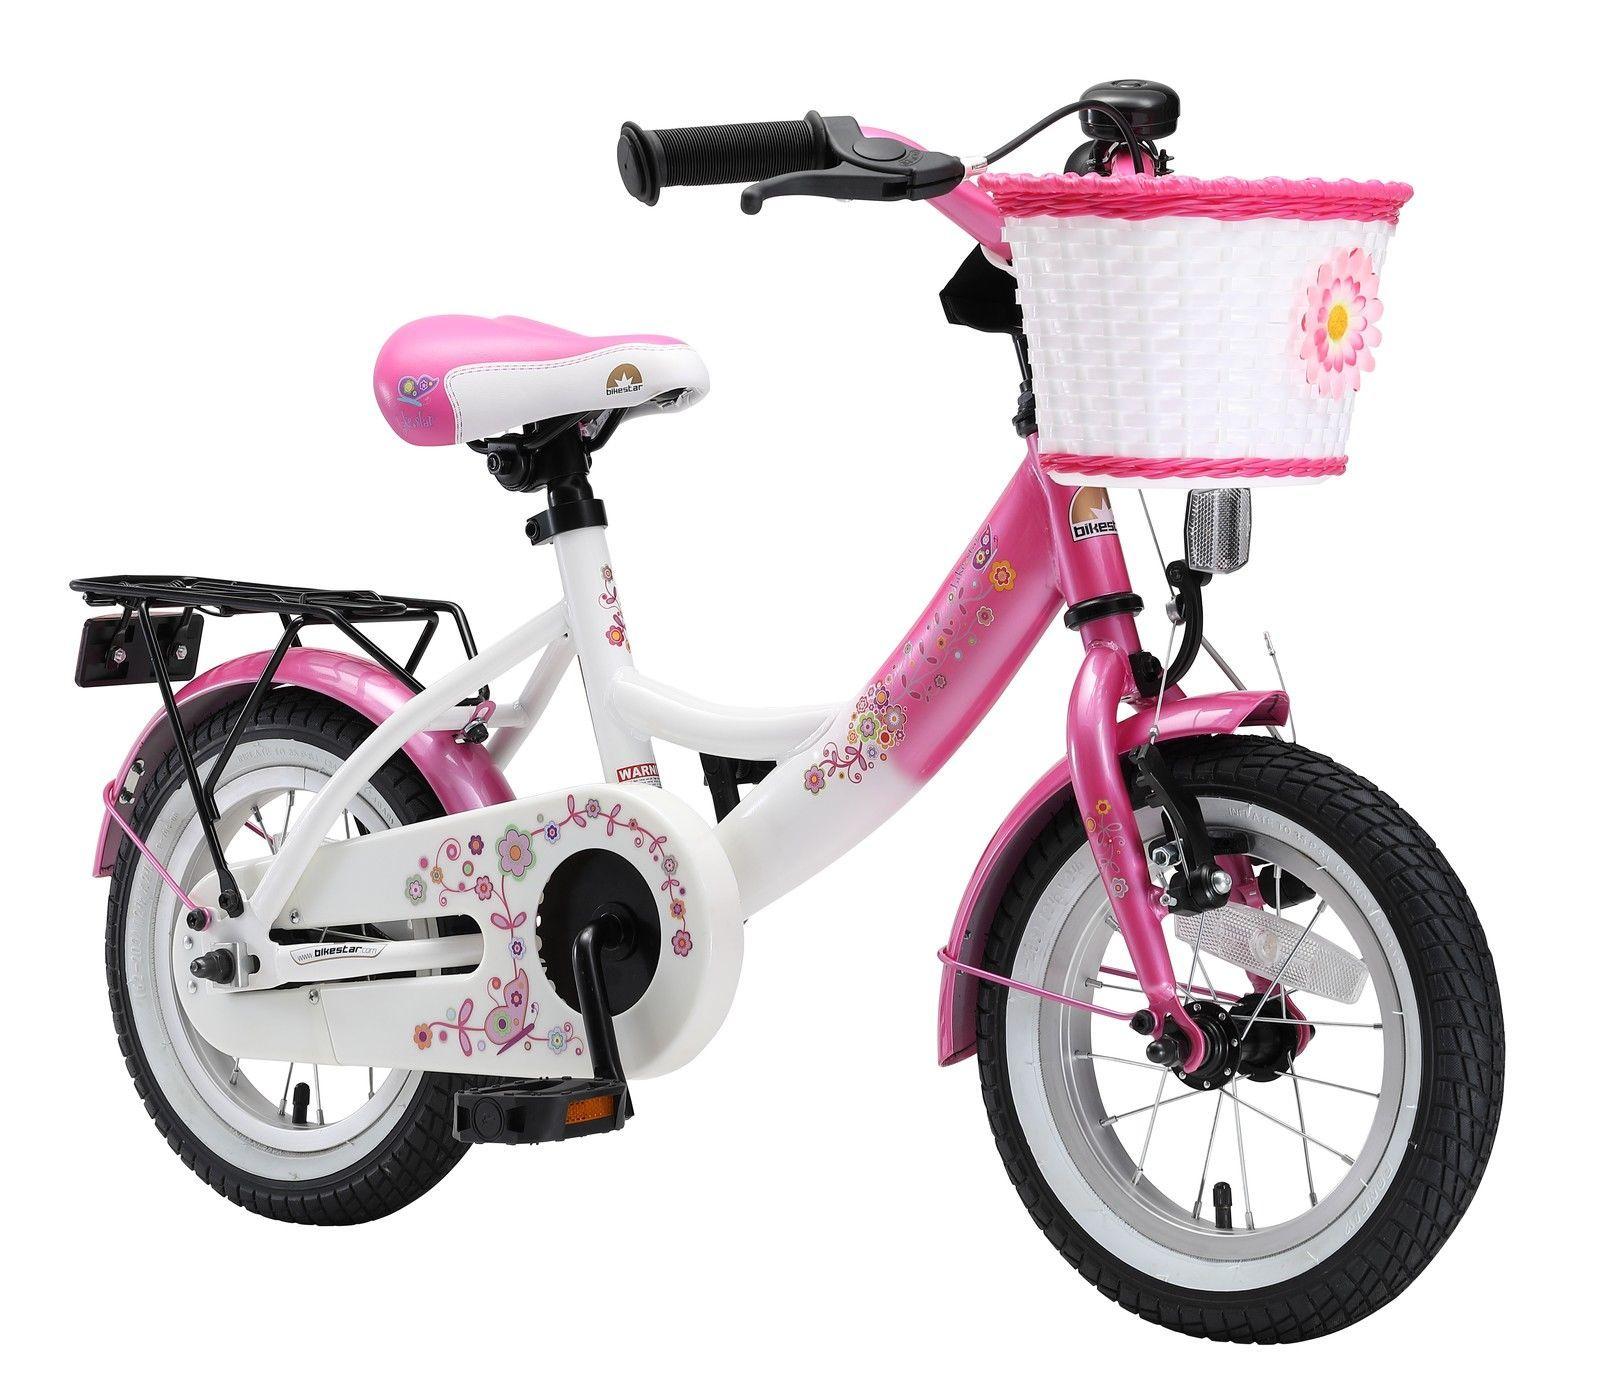 Ebay Angebot Bikestar Kinderfahrrad Ab 3 Jahre 12er Classic Edition Flamingo Pink Eur 119 99 Angebotsende Dienstag Bike Quickberater Kinderfahrrad Kinder Fahrrad Und Fahrrad